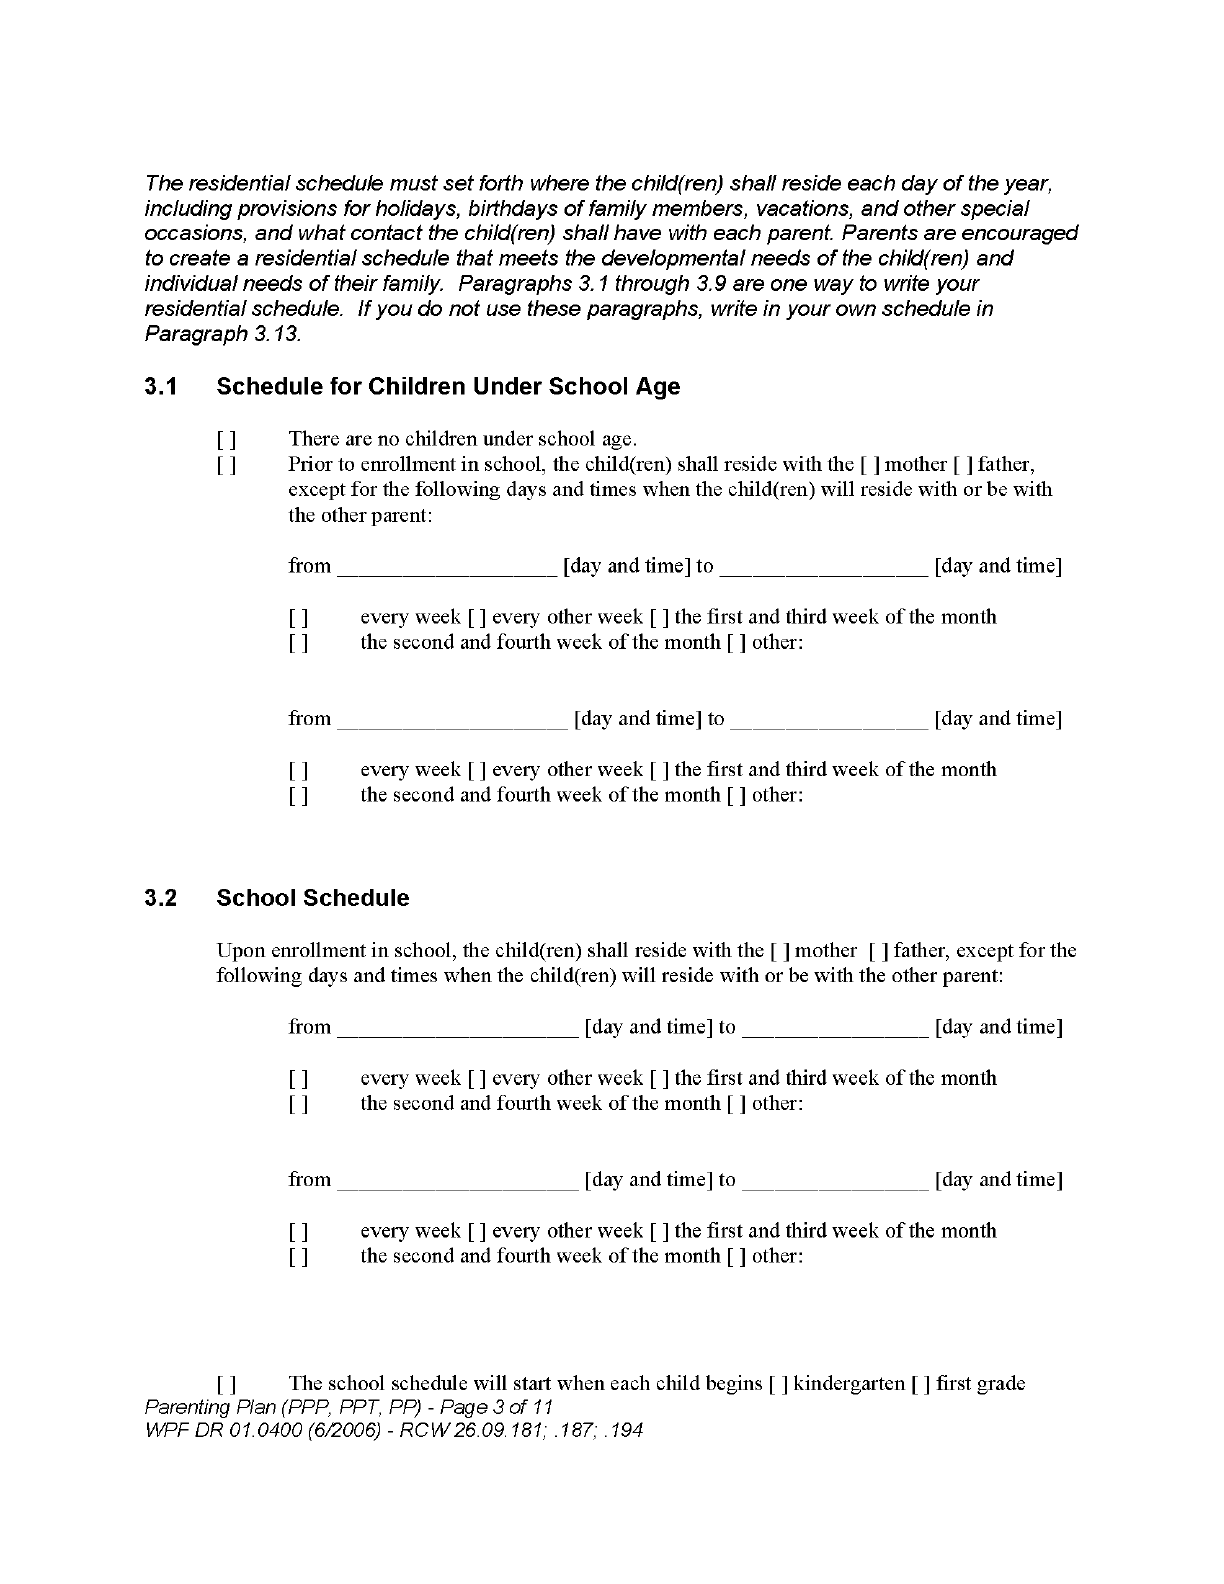 Parenting Plan Form